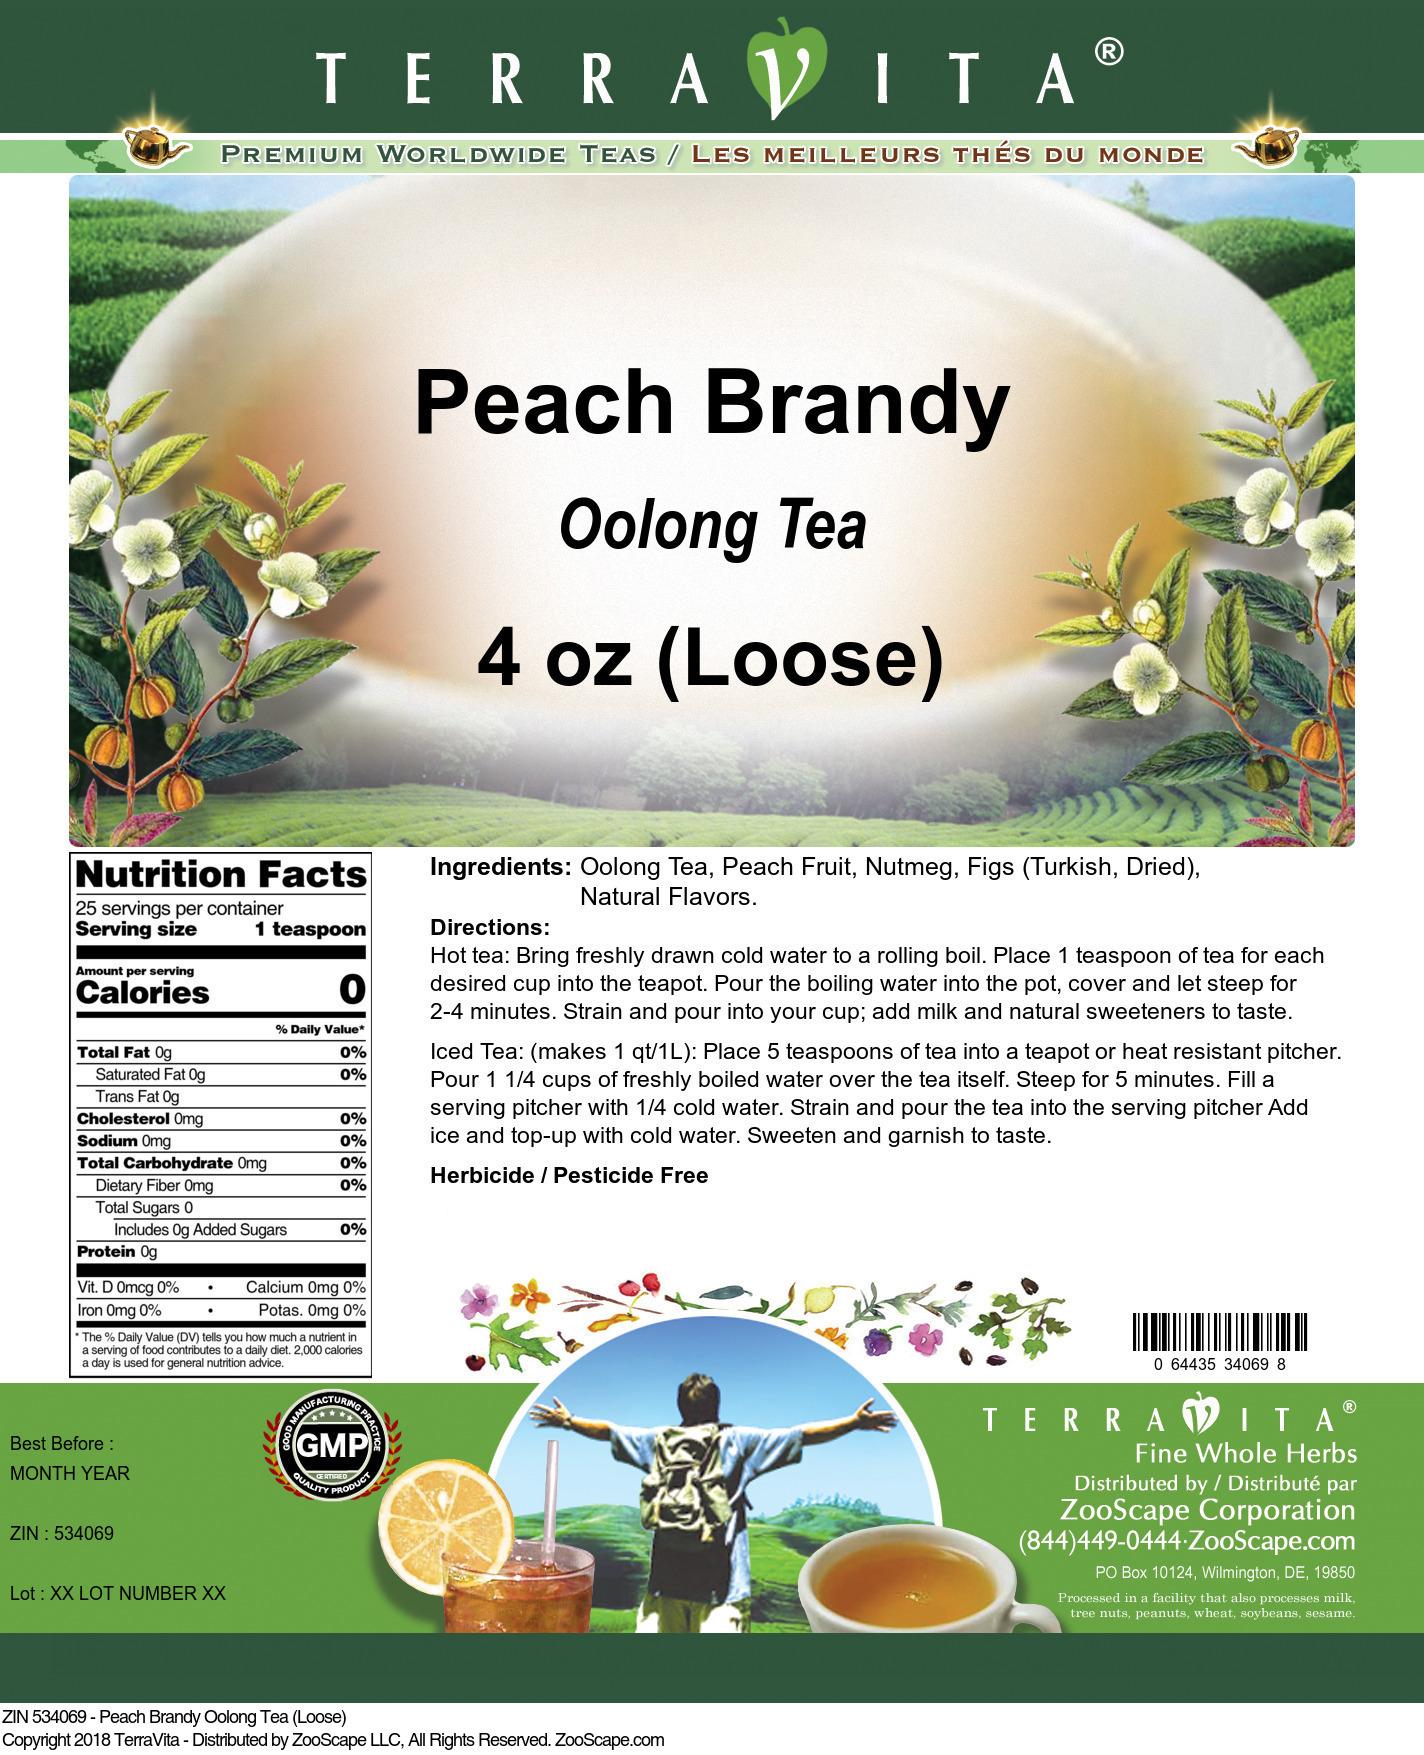 Peach Brandy Oolong Tea (Loose)